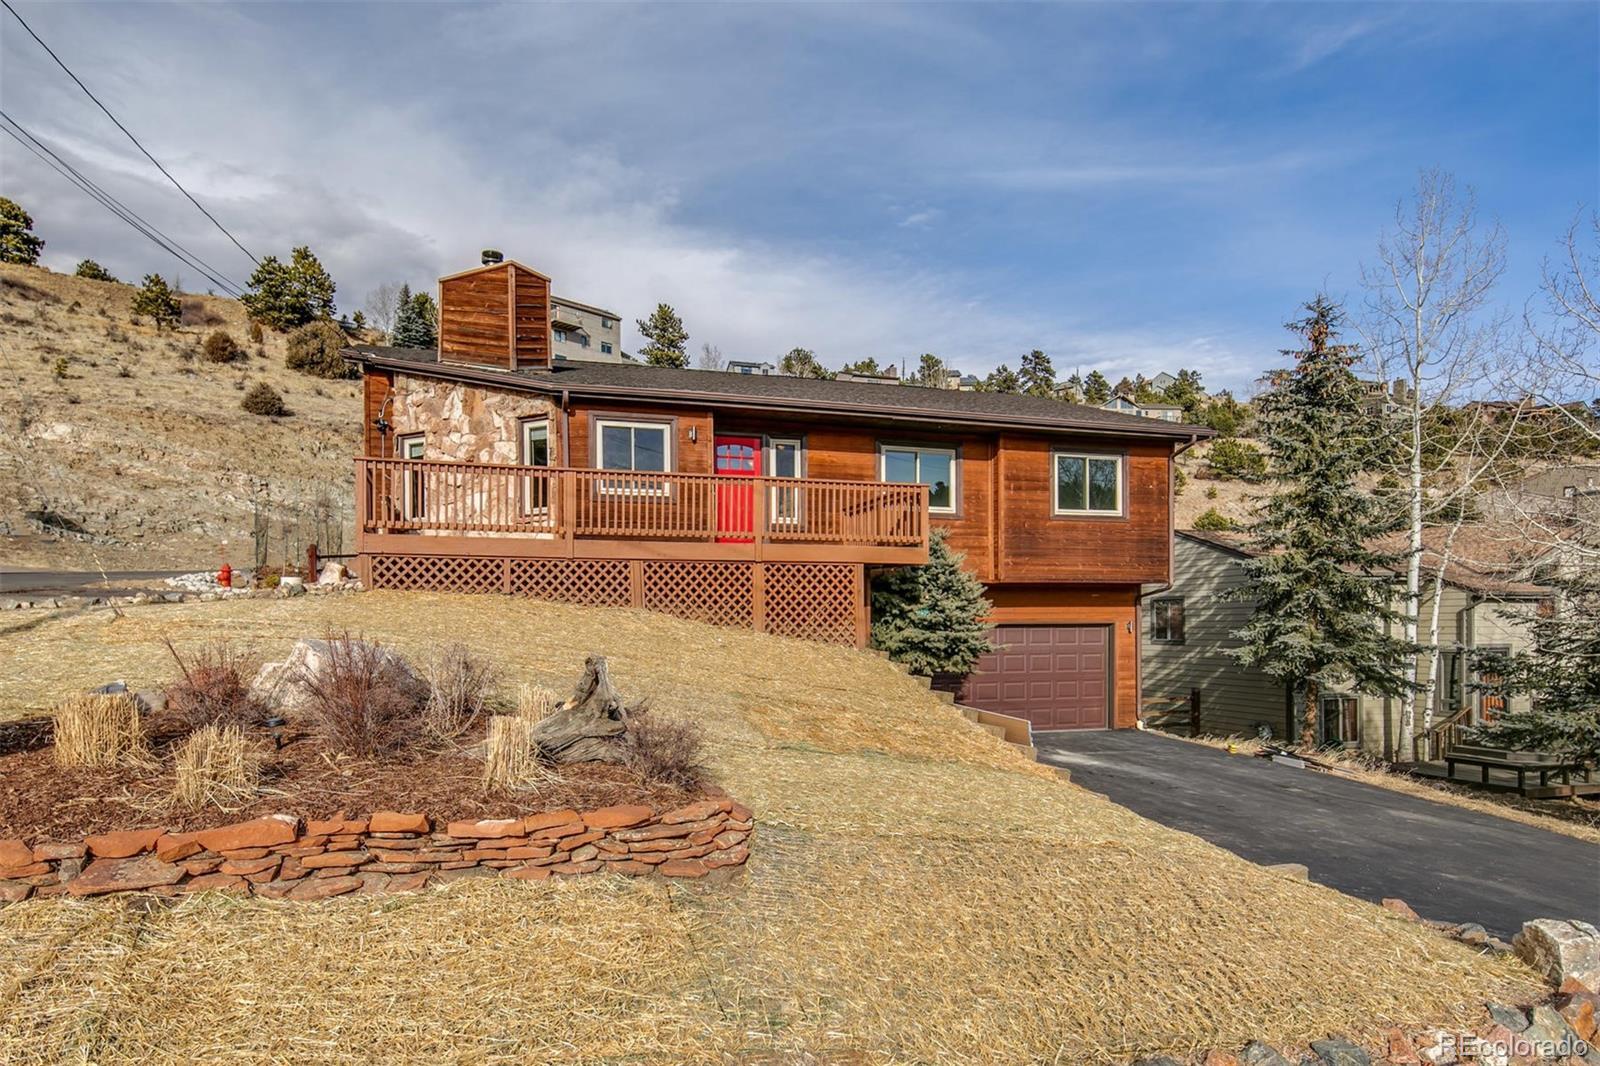 29567 Buckboard Lane, Evergreen, CO 80439 - Evergreen, CO real estate listing